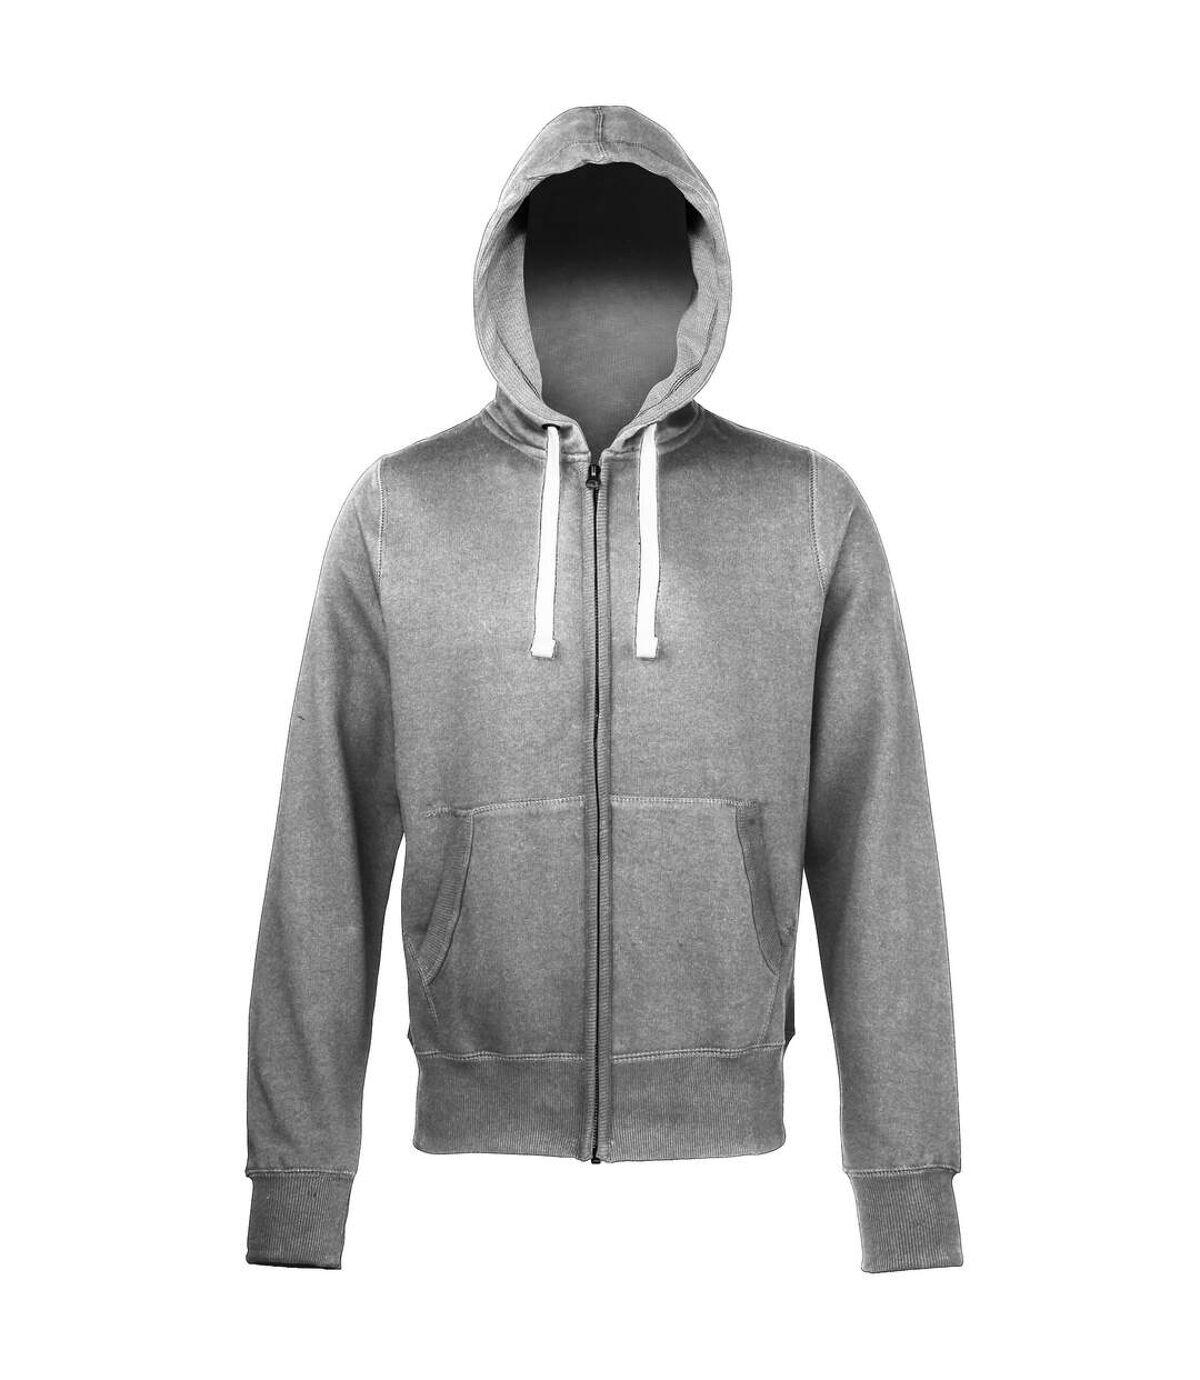 Awdis Chunky Premium Heavyweight Hooded Sweatshirt / Hoodie / Zoodie (Charcoal) - UTRW181